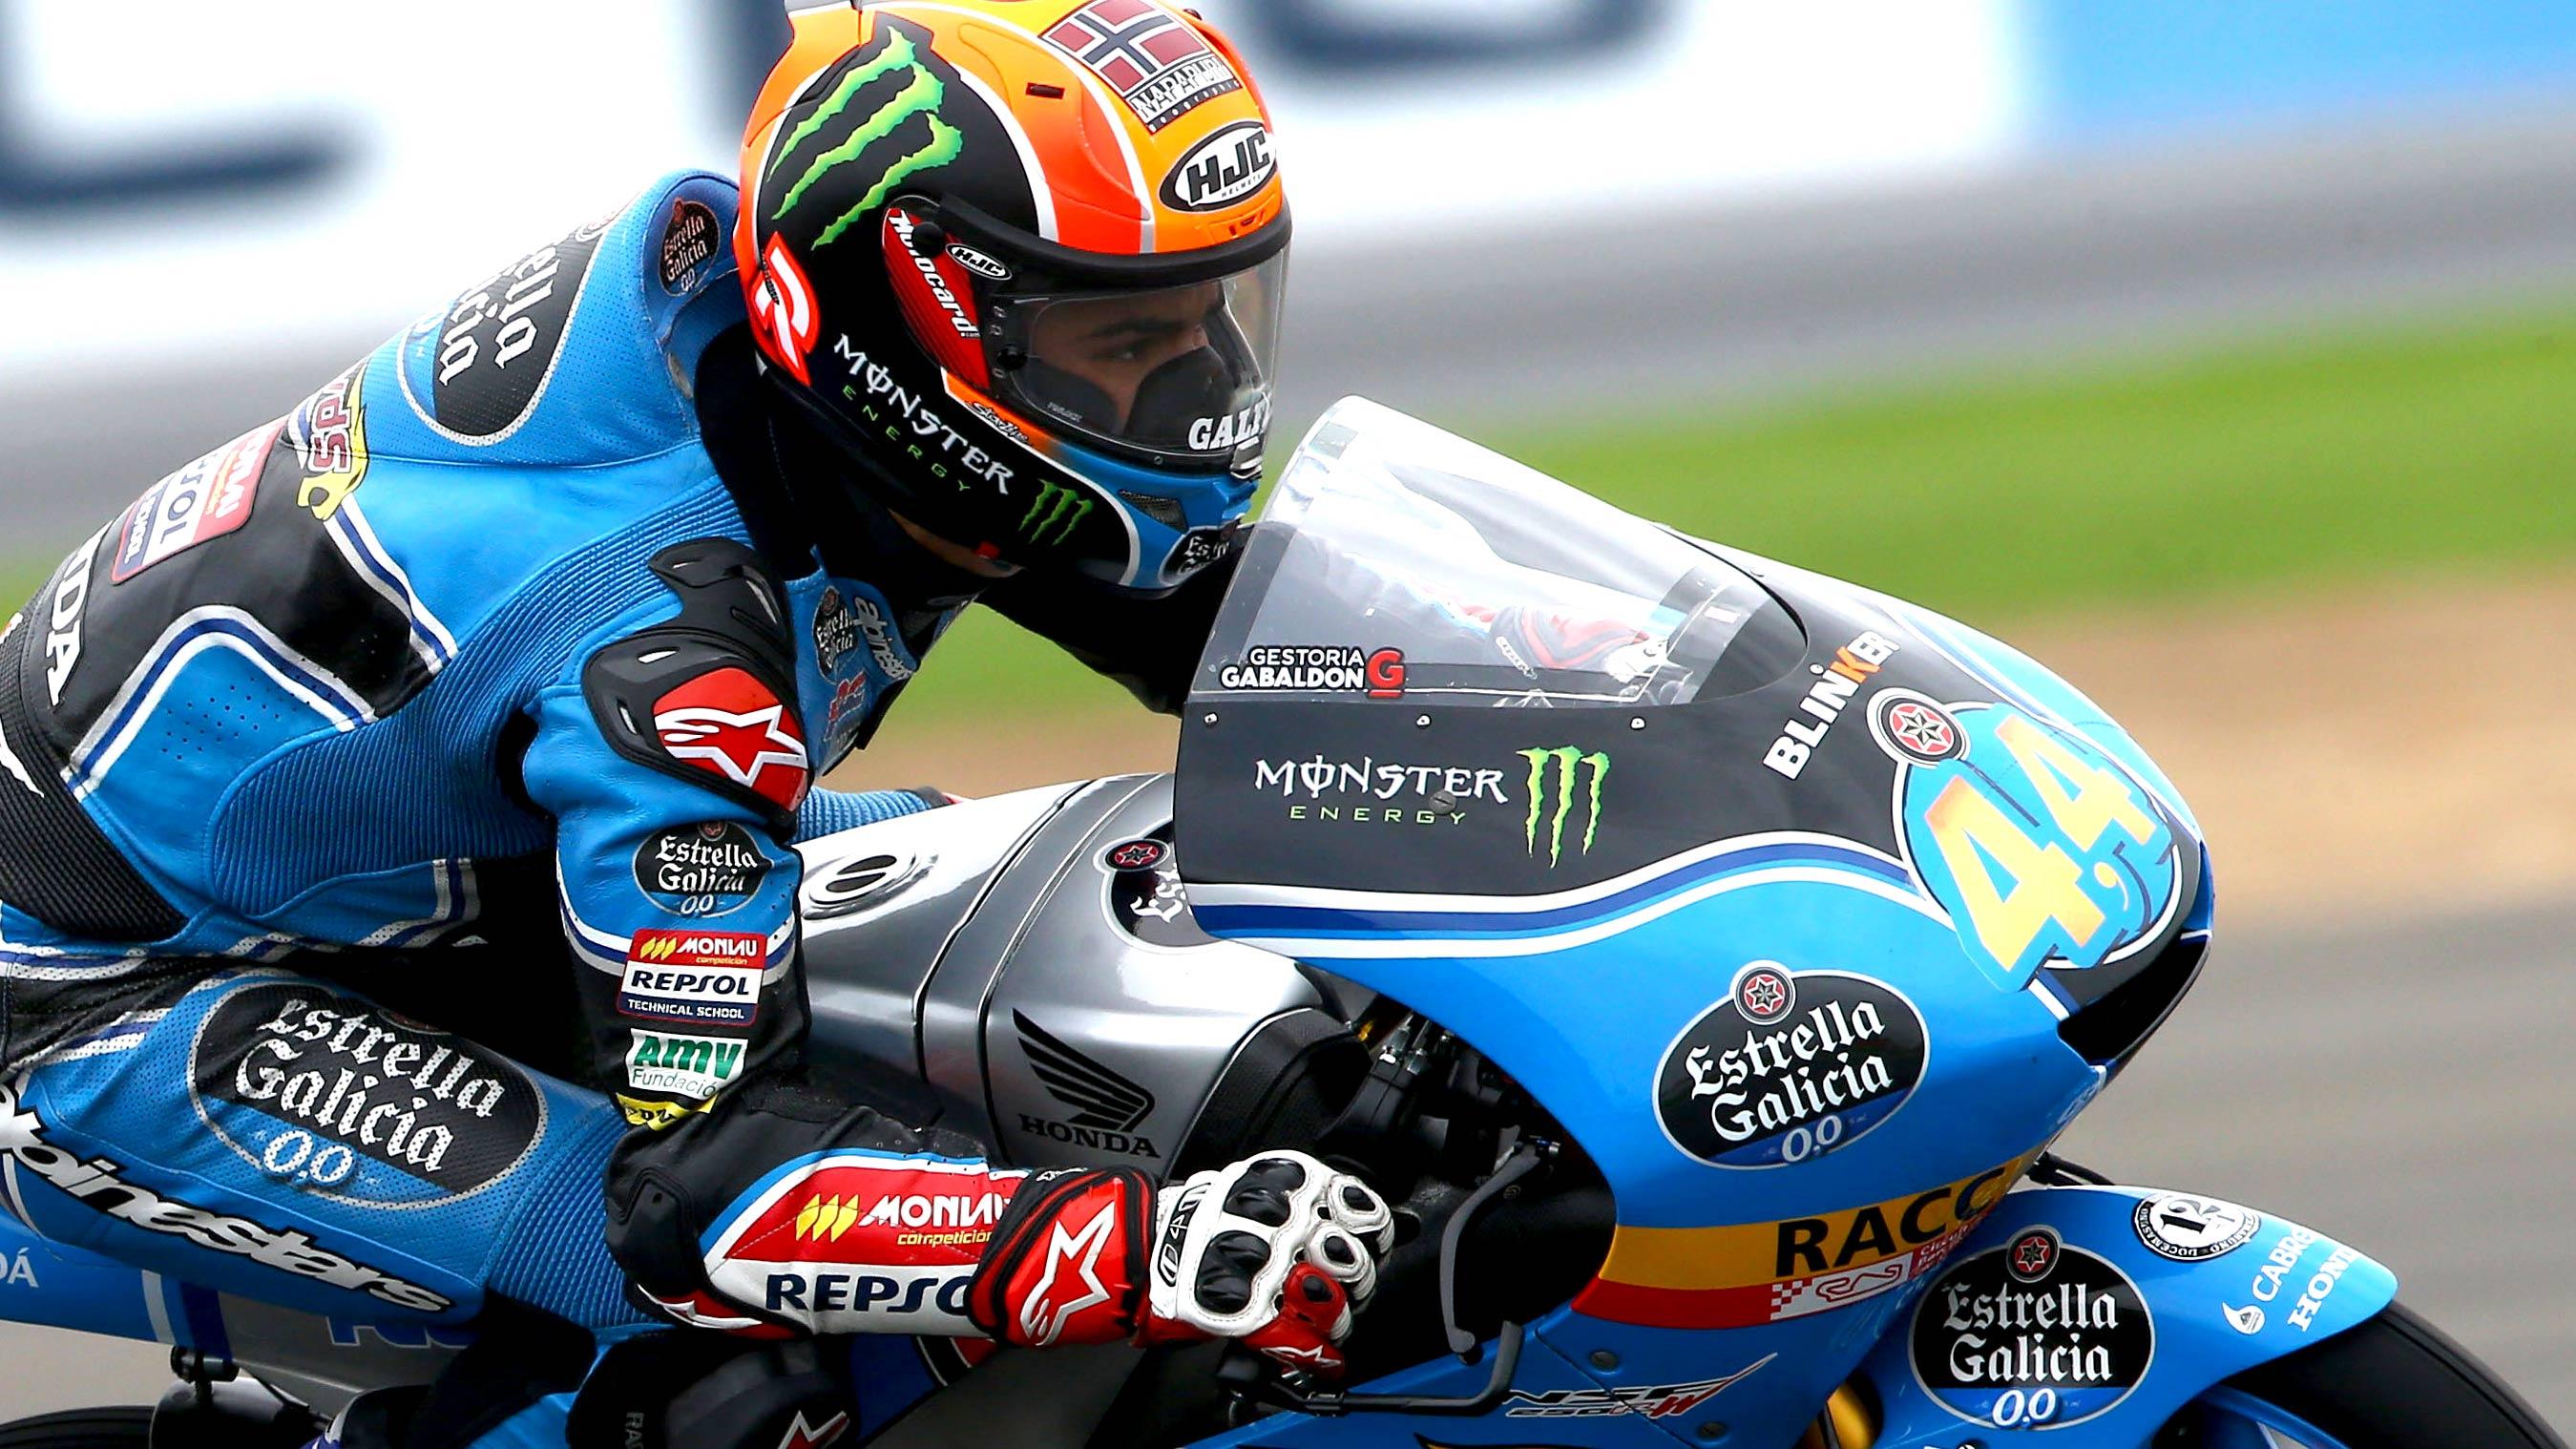 Arón Canet conquista Silverstone en un duelo interminable en Moto3